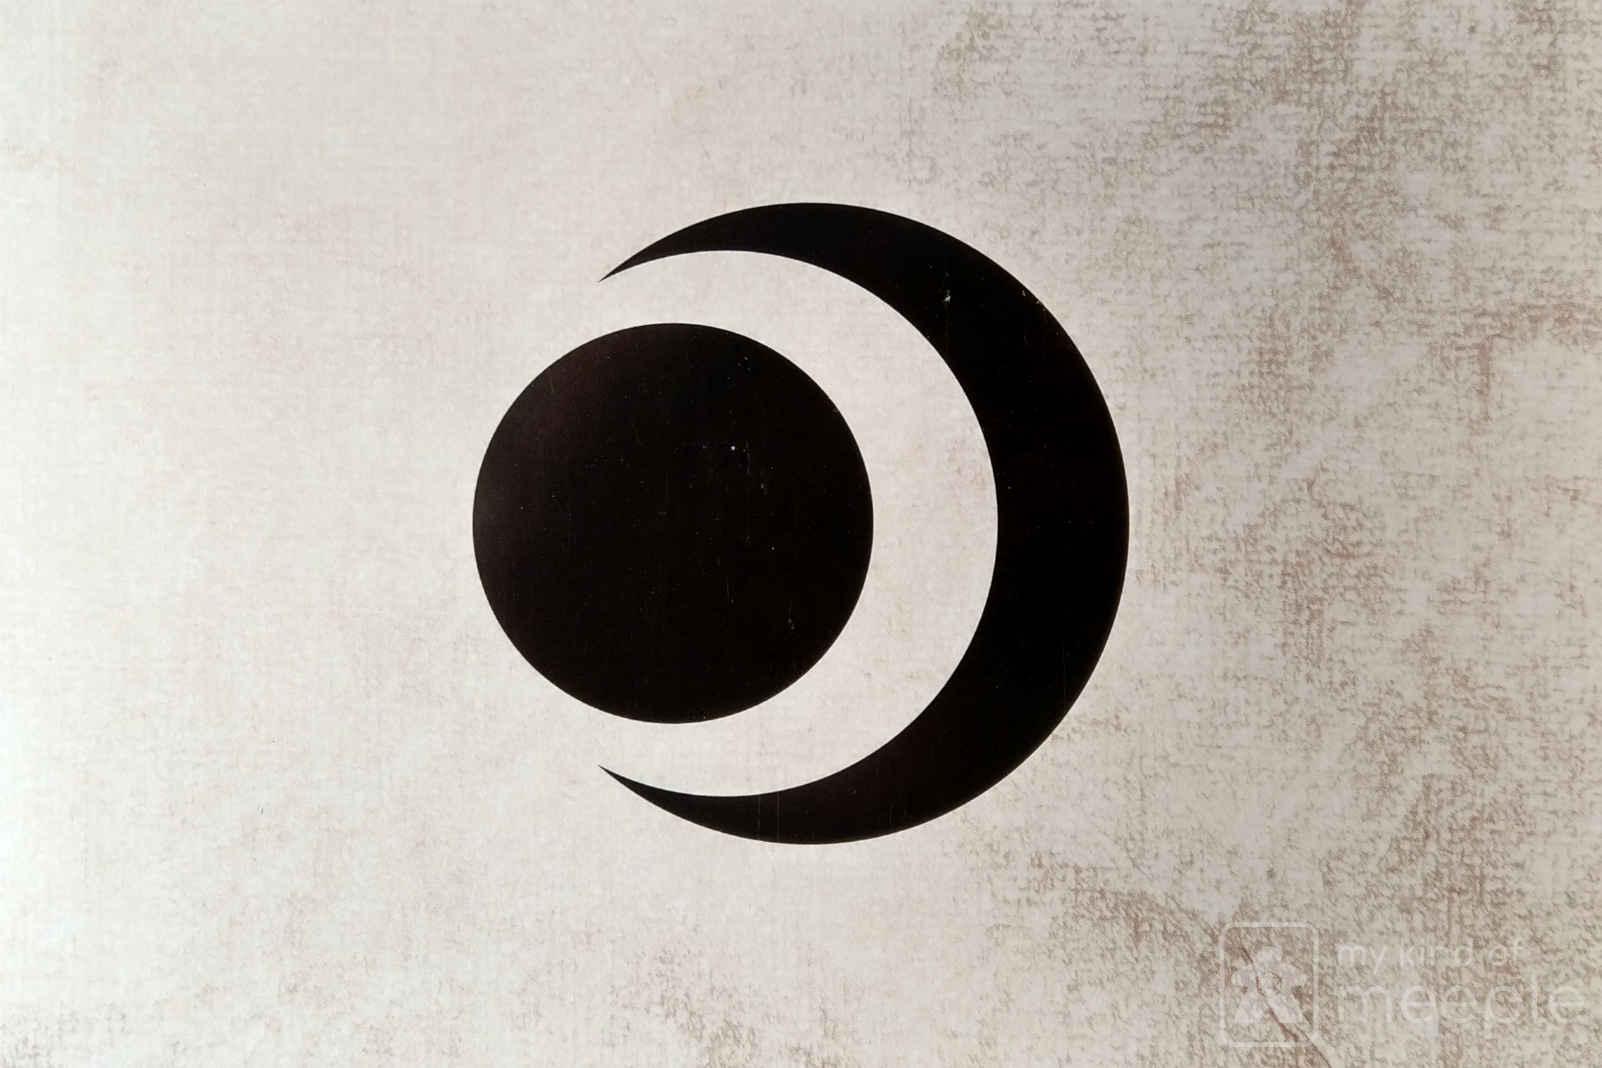 Gloomhaven Nightshroud symbol Eclipse Moon